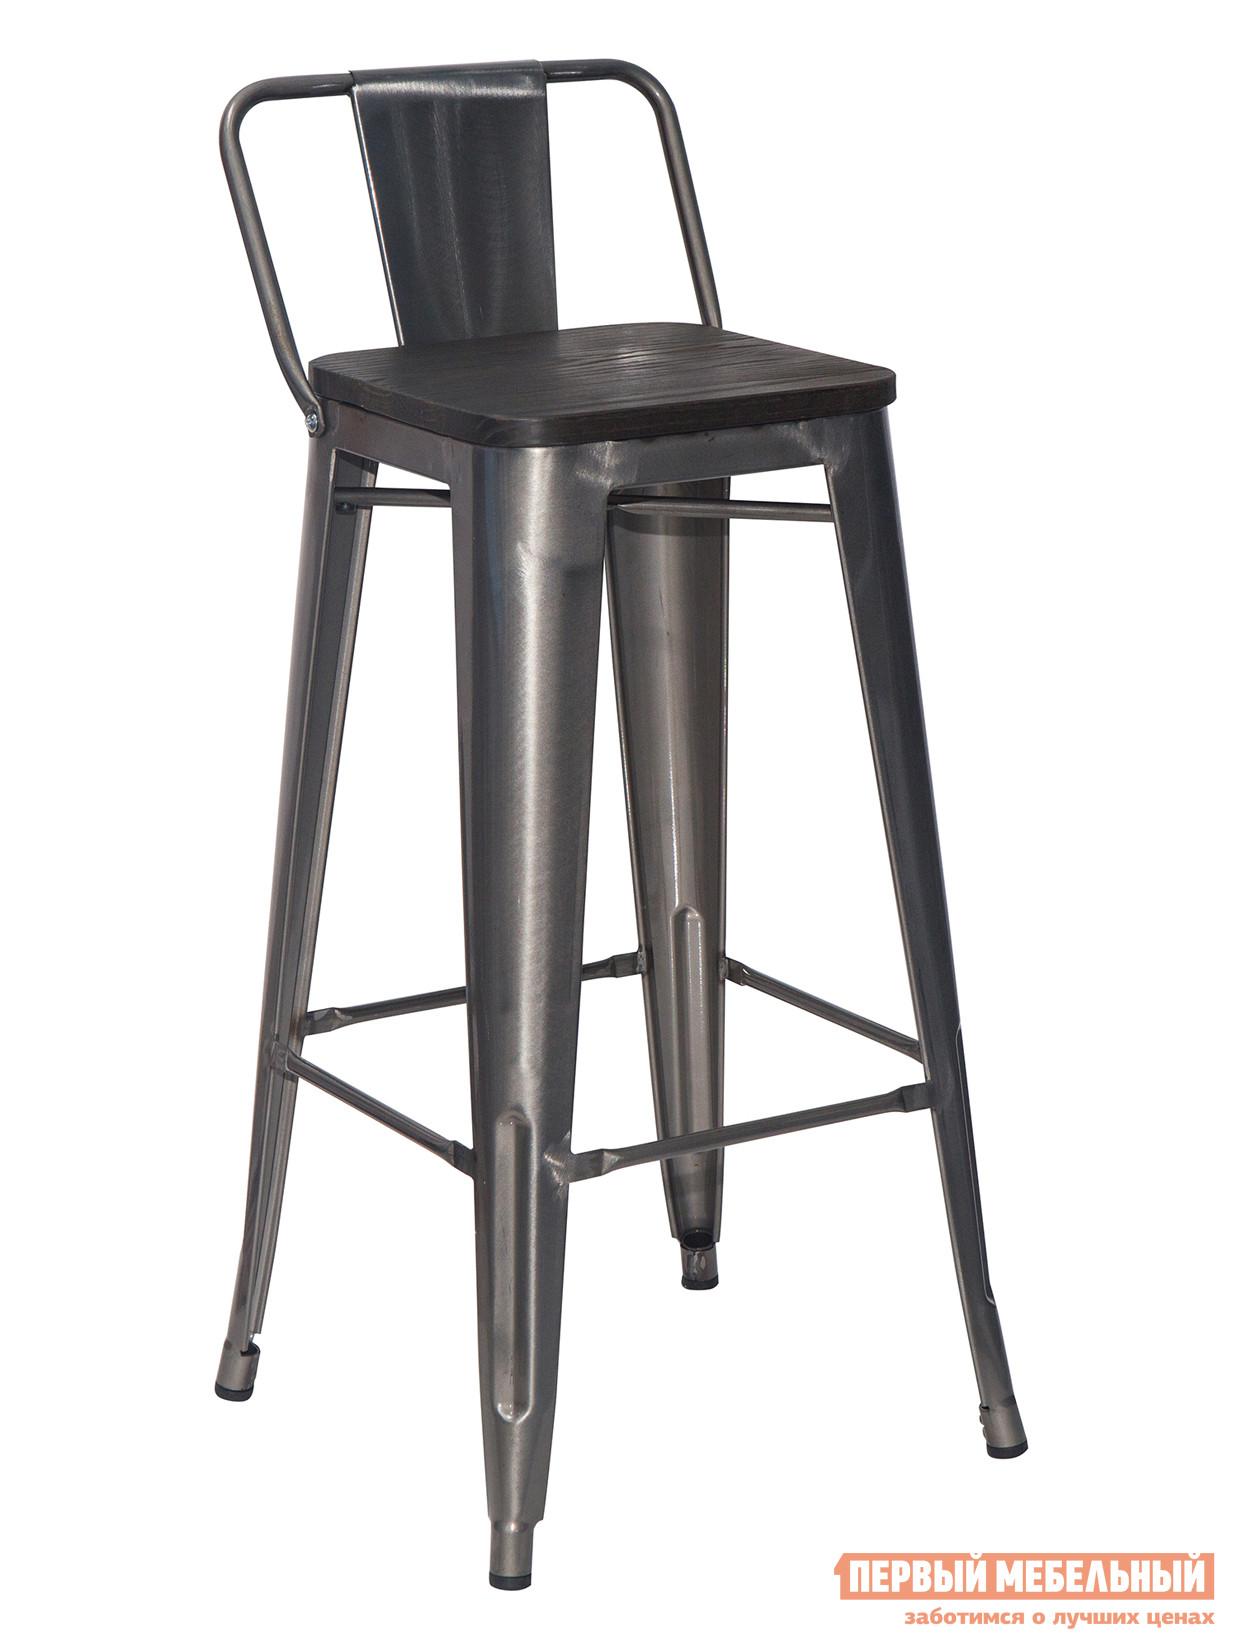 Барный стул Stool Group Толикс Вуд living room chair yellow red color stool retail wholesale free shipping furniture shop children stool